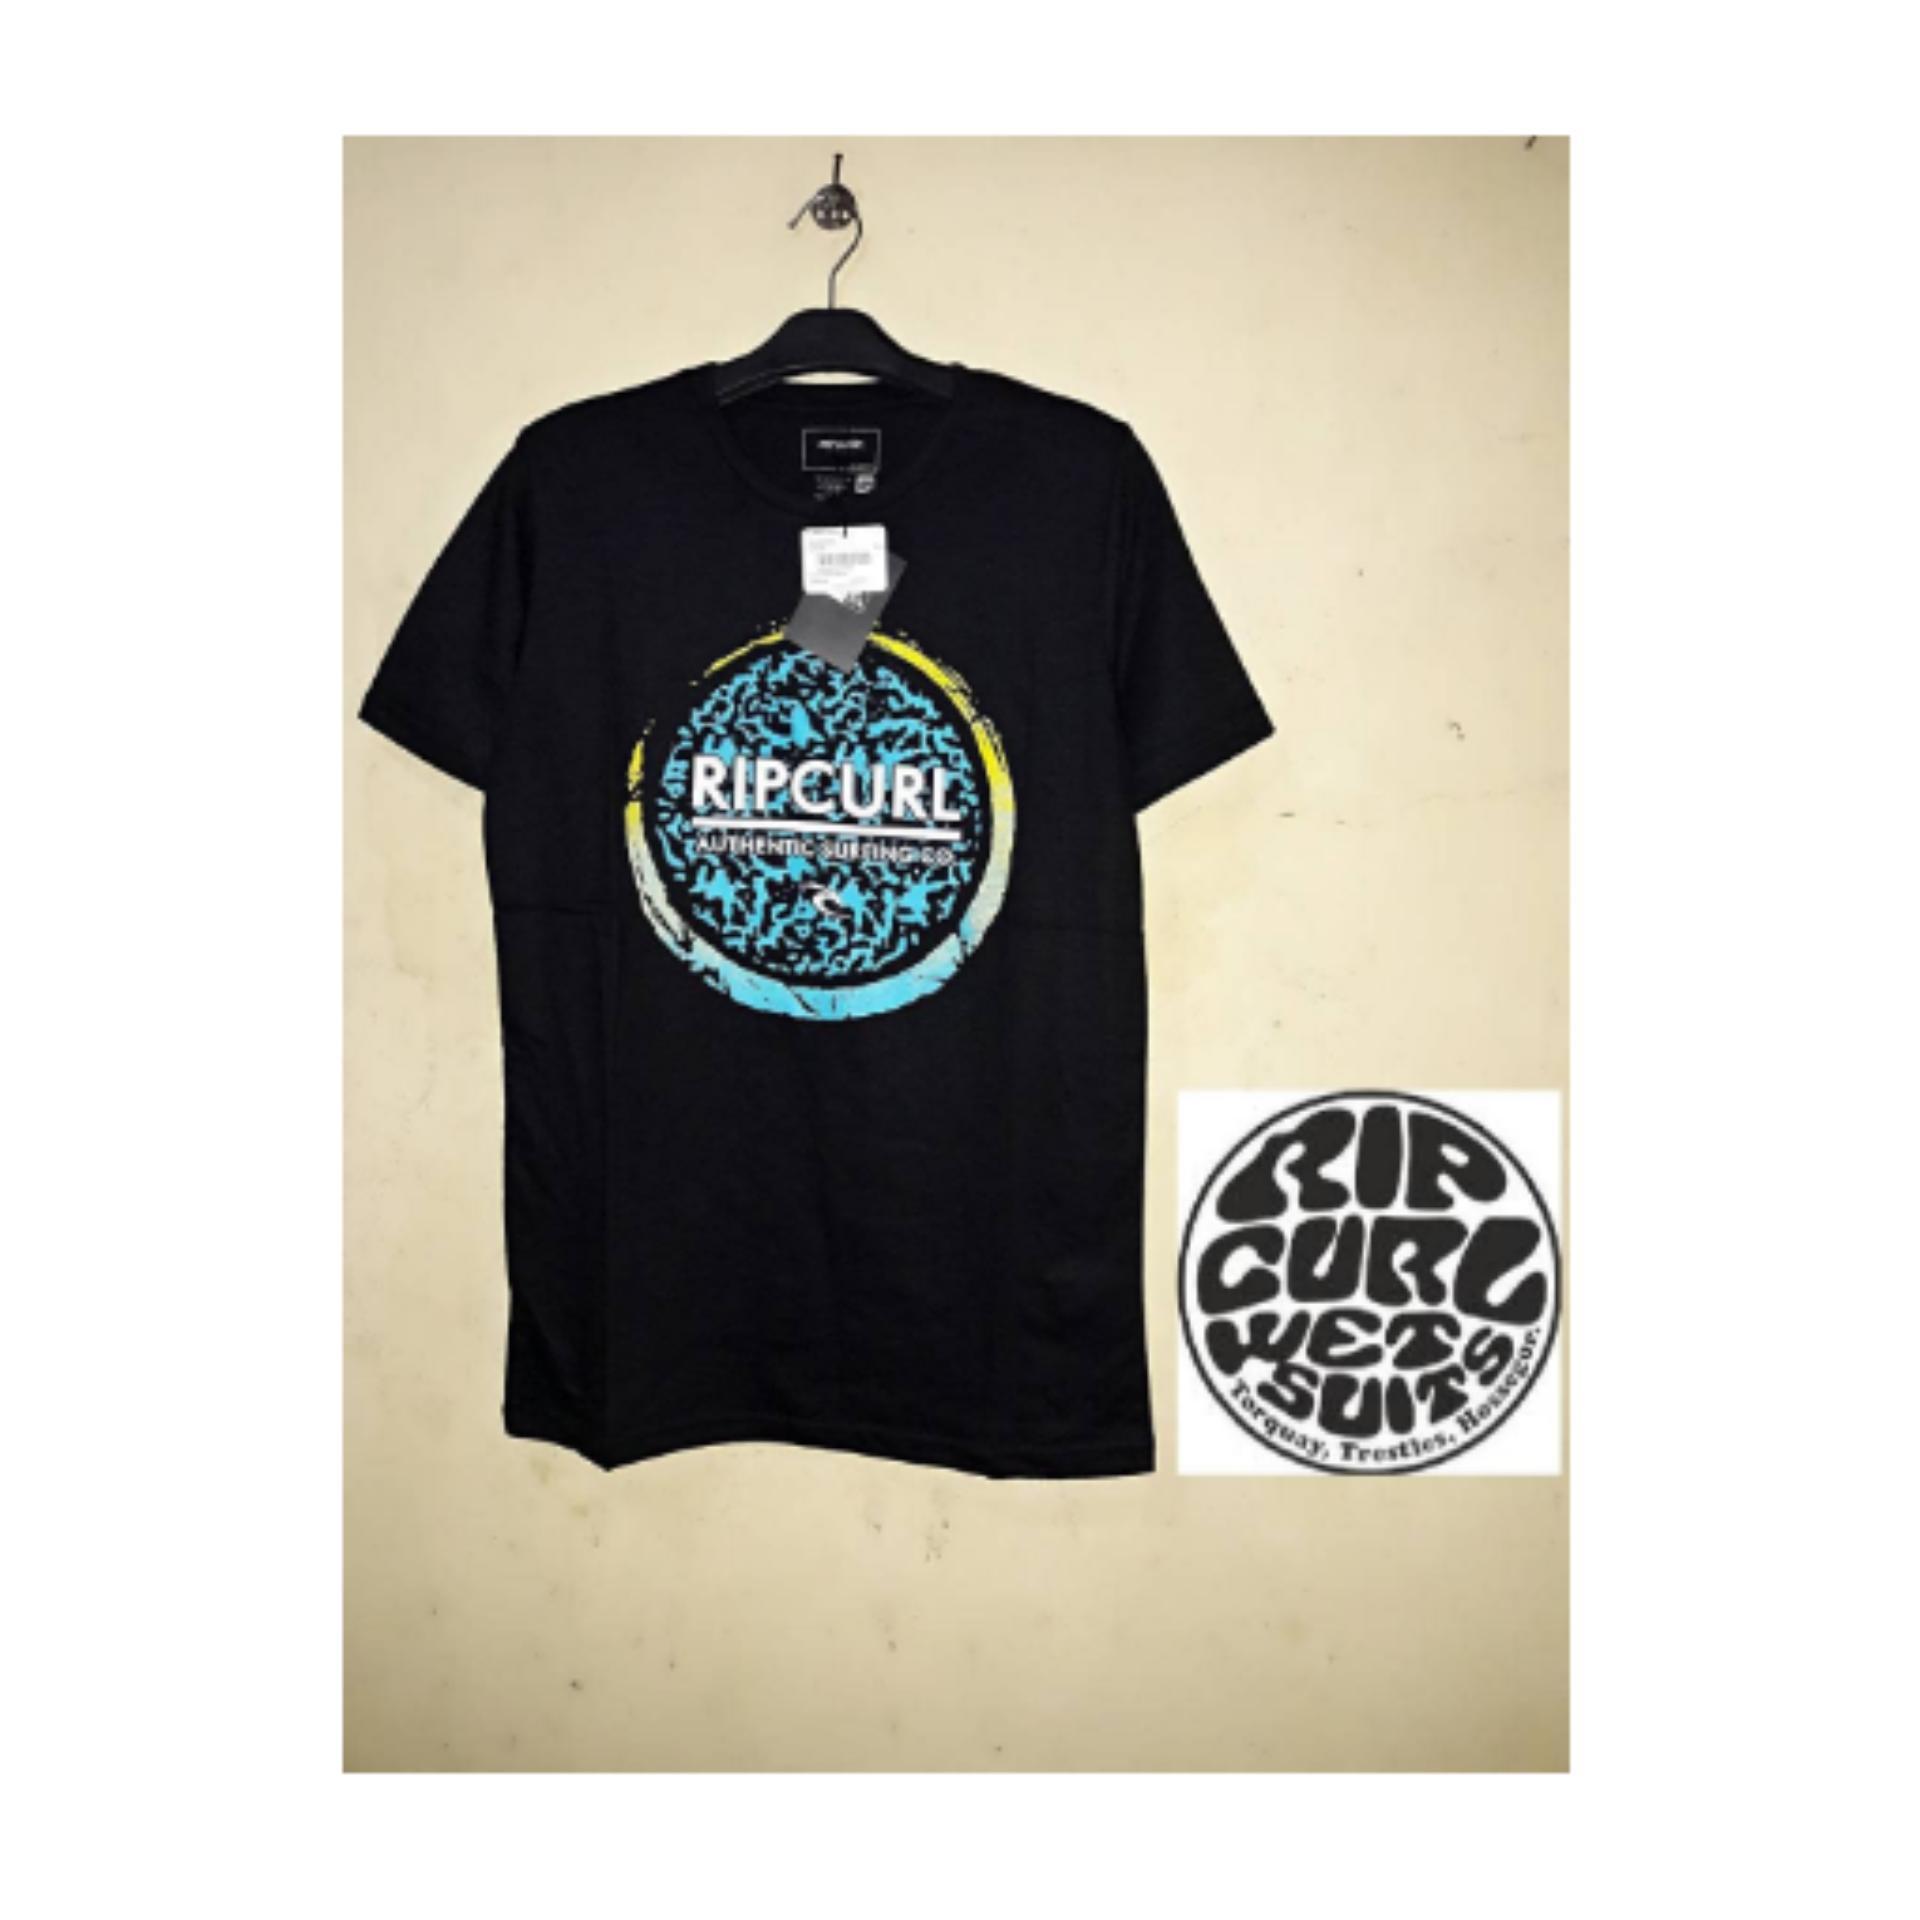 Anggaran Terbaik T Shirt Kaos Distro Ripcurl Black Harga Penawaran